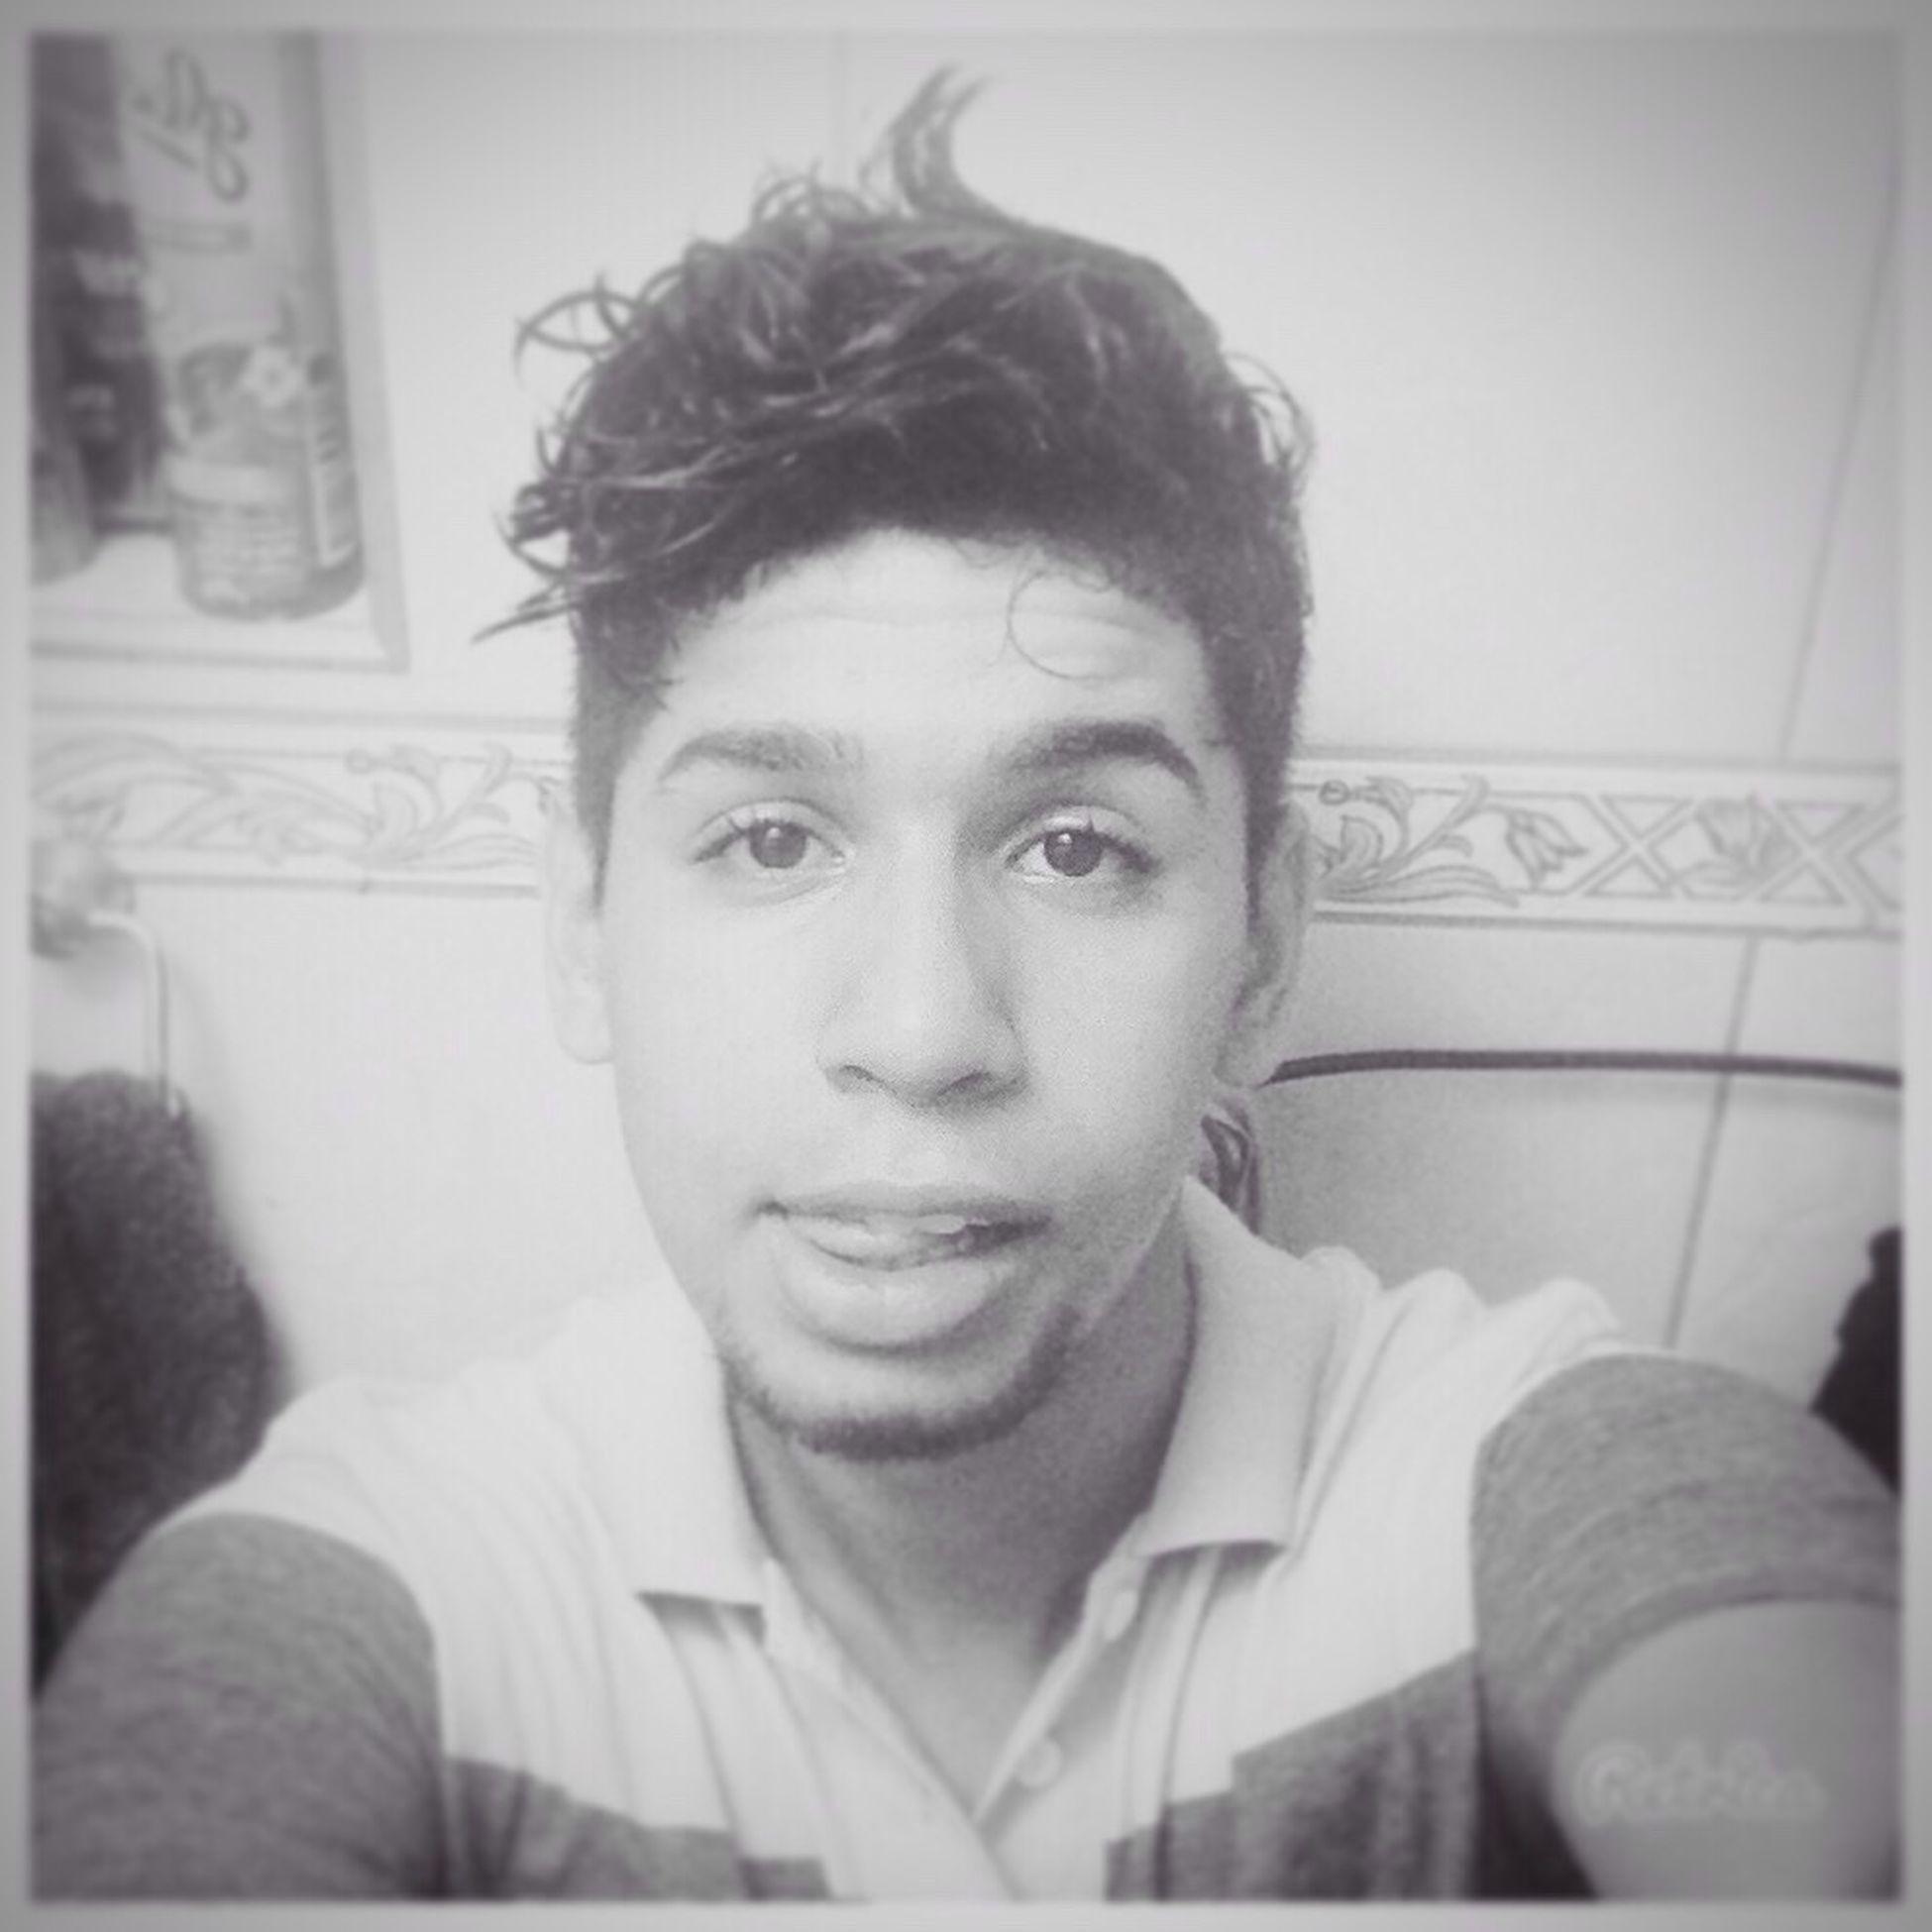 Língua p vcs ✌️😂💝🙊😳 HelloEyeEm That's Me Smile ✌ IloveHair Letitbesexy